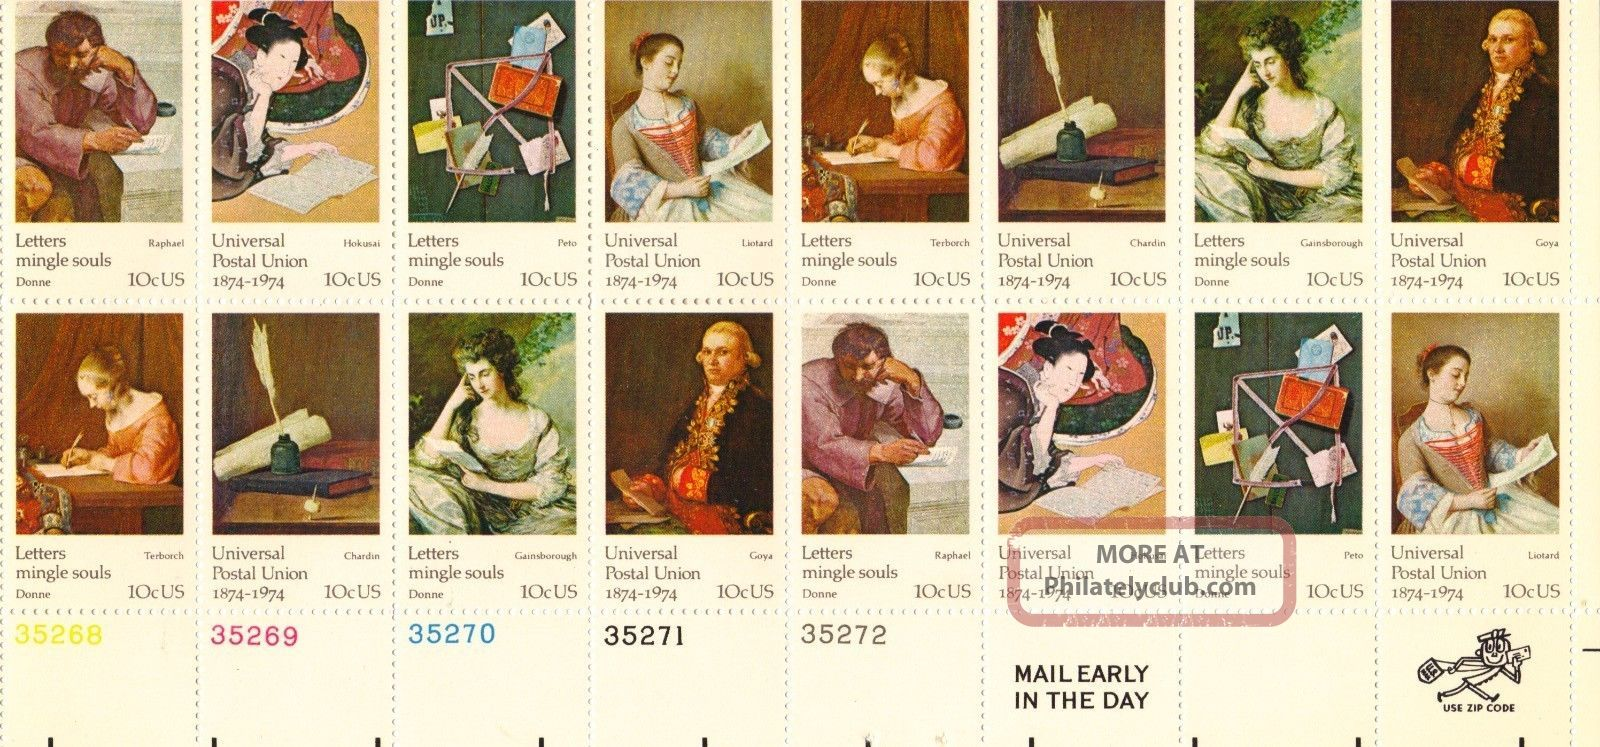 Us Stamp Sheet Scott 1530 - 1537 1974 10 Cent 16 Count Universal Postal Union United States photo